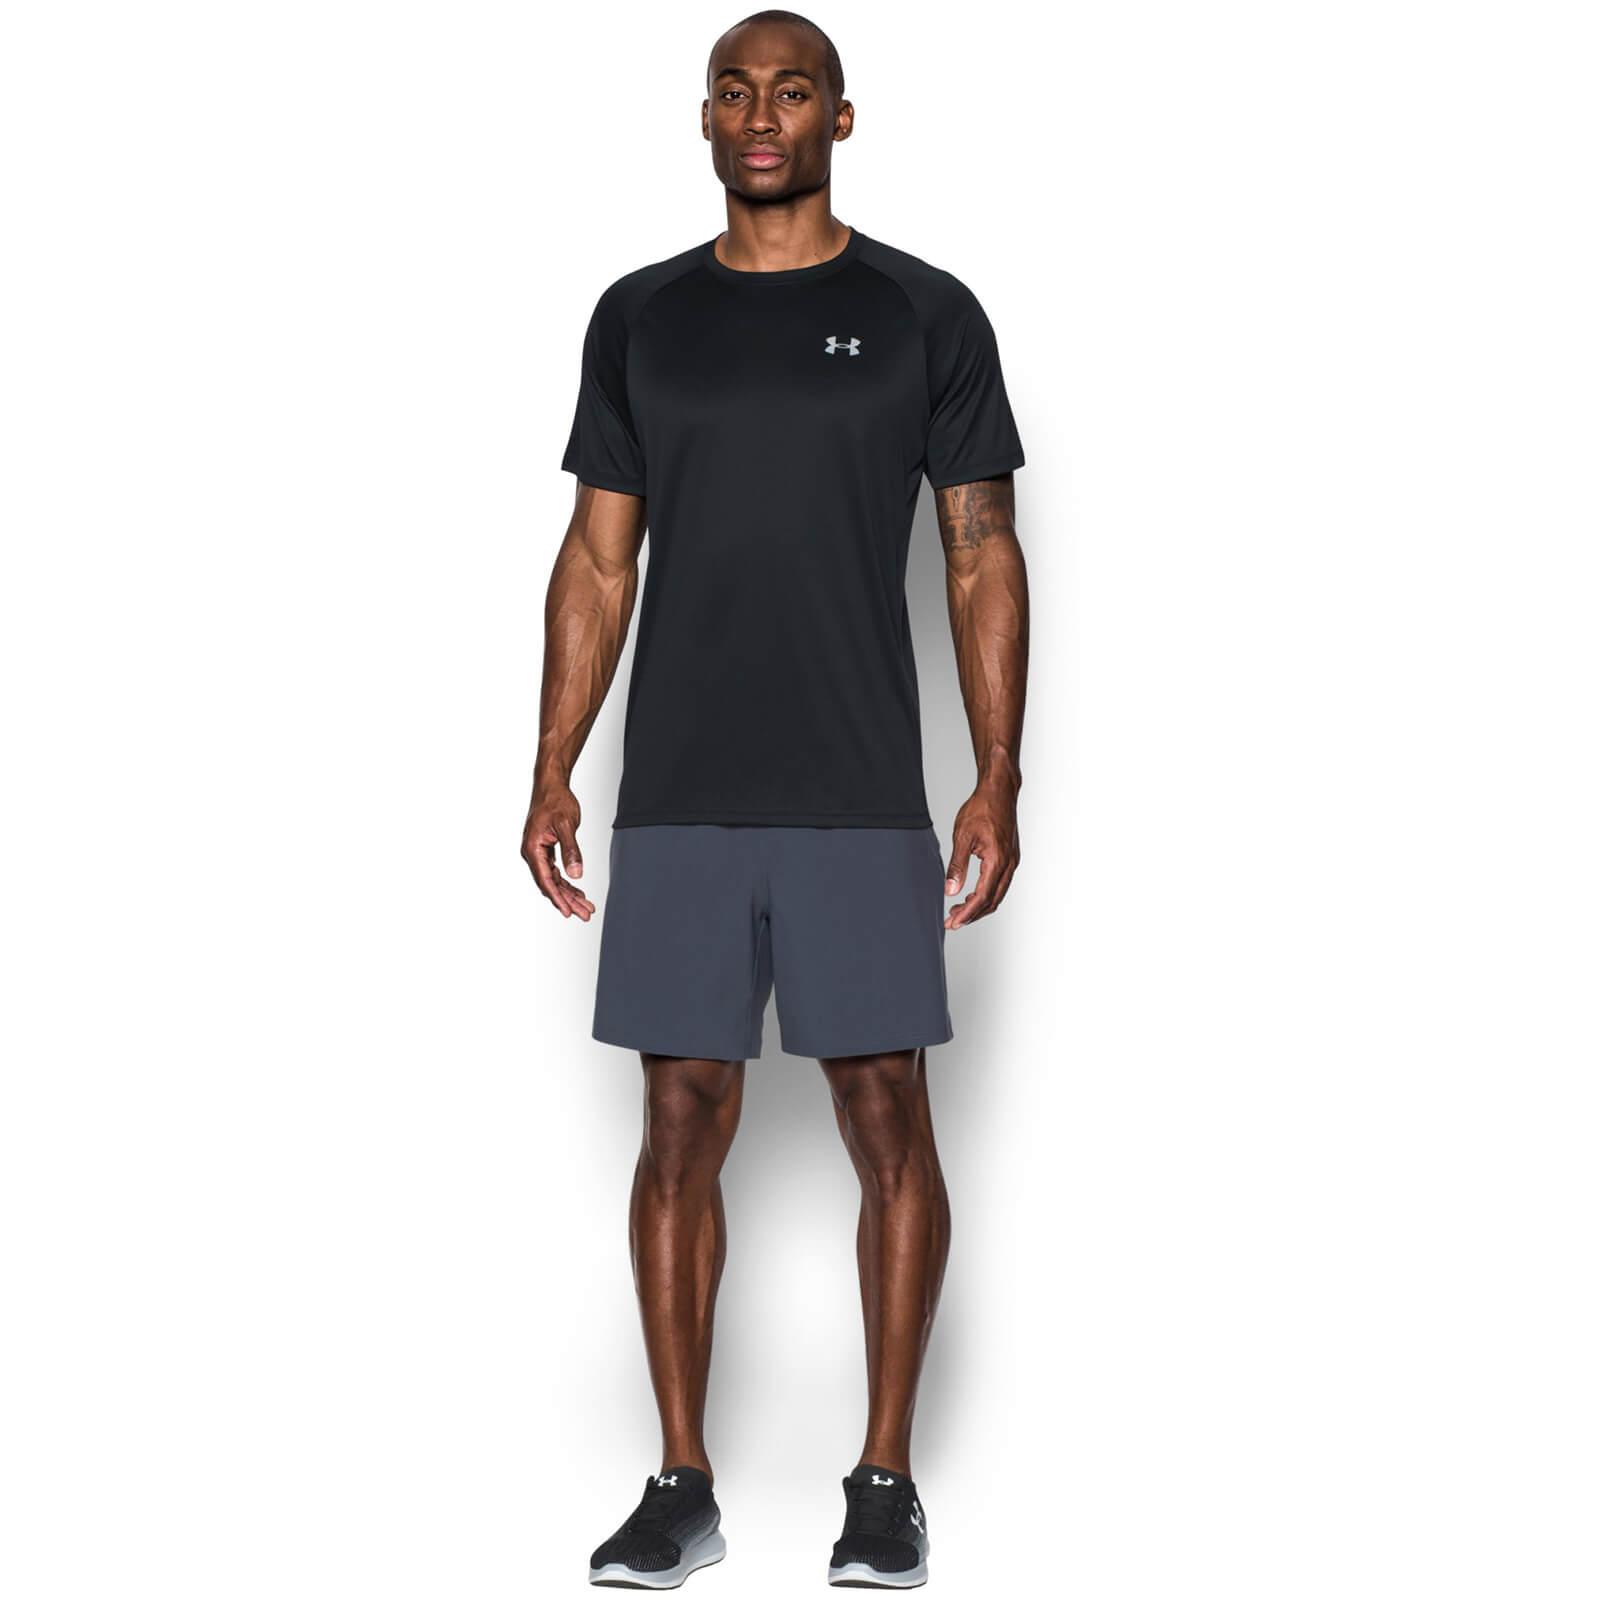 447306a6 Under Armour Men's Speed Stride Run T-Shirt - Black Sports & Leisure |  TheHut.com